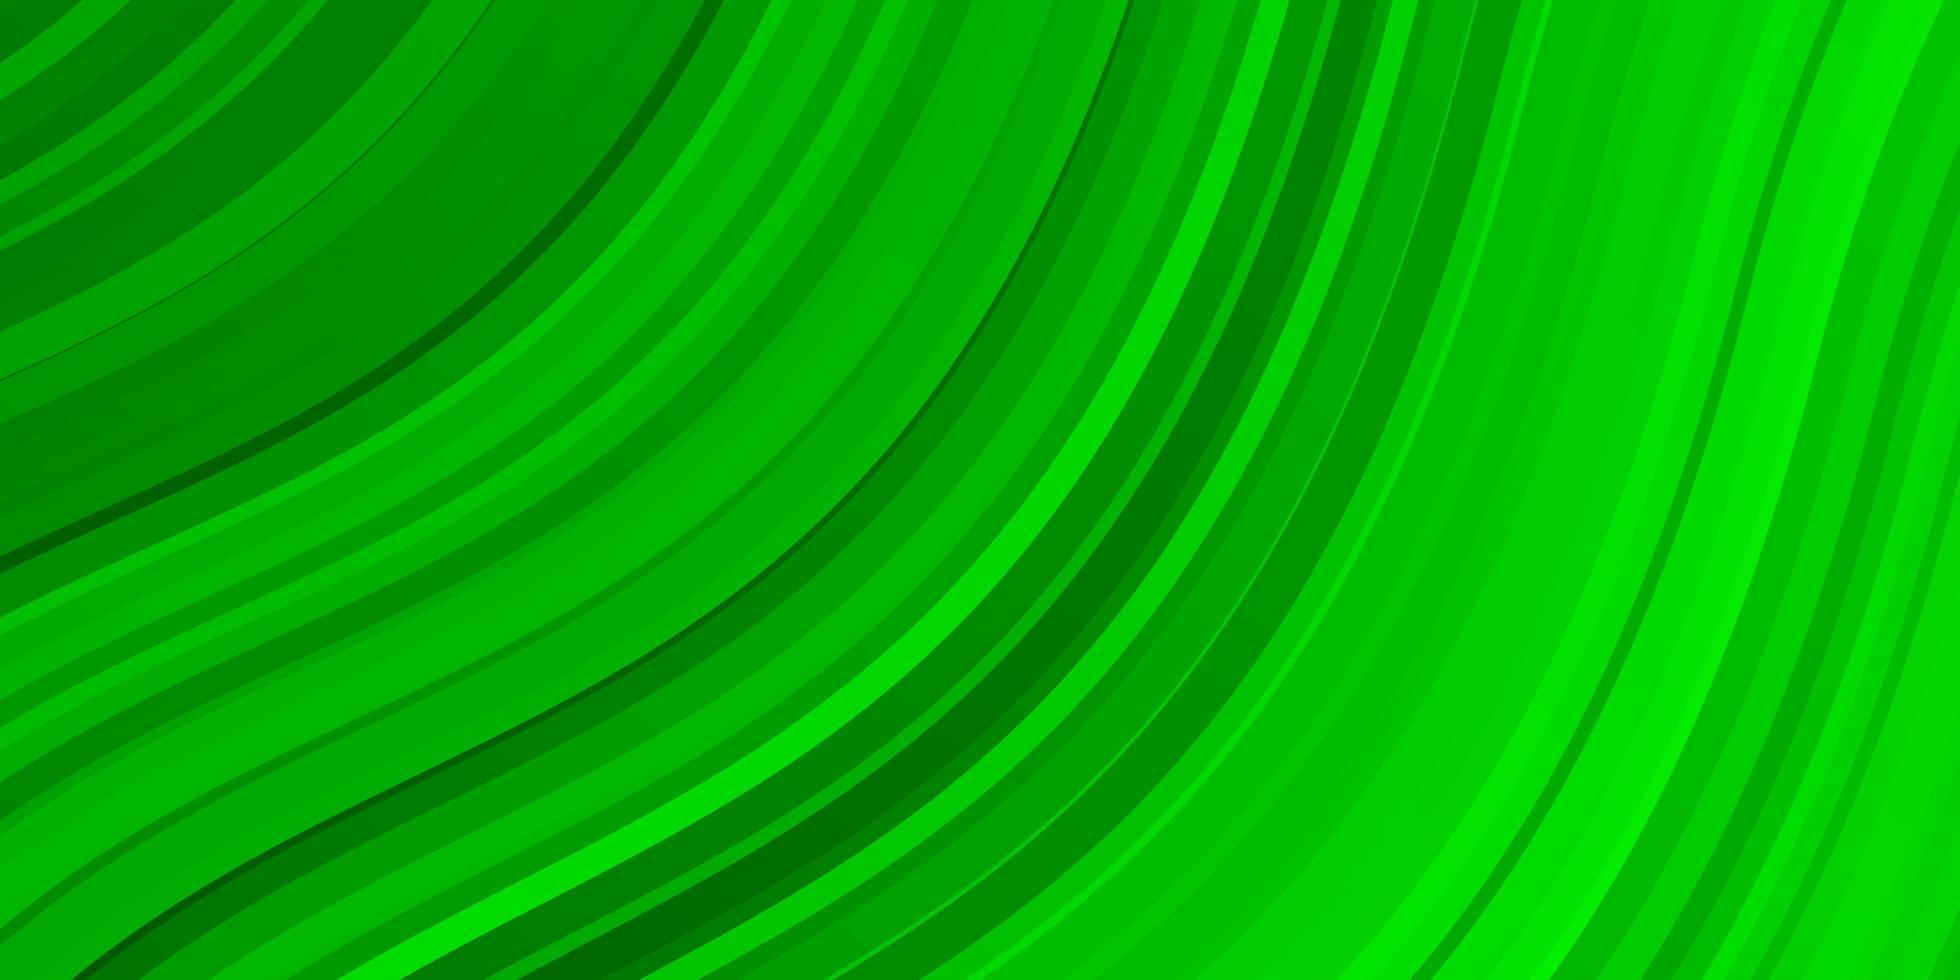 hellgrünes Layout mit Kurven. vektor